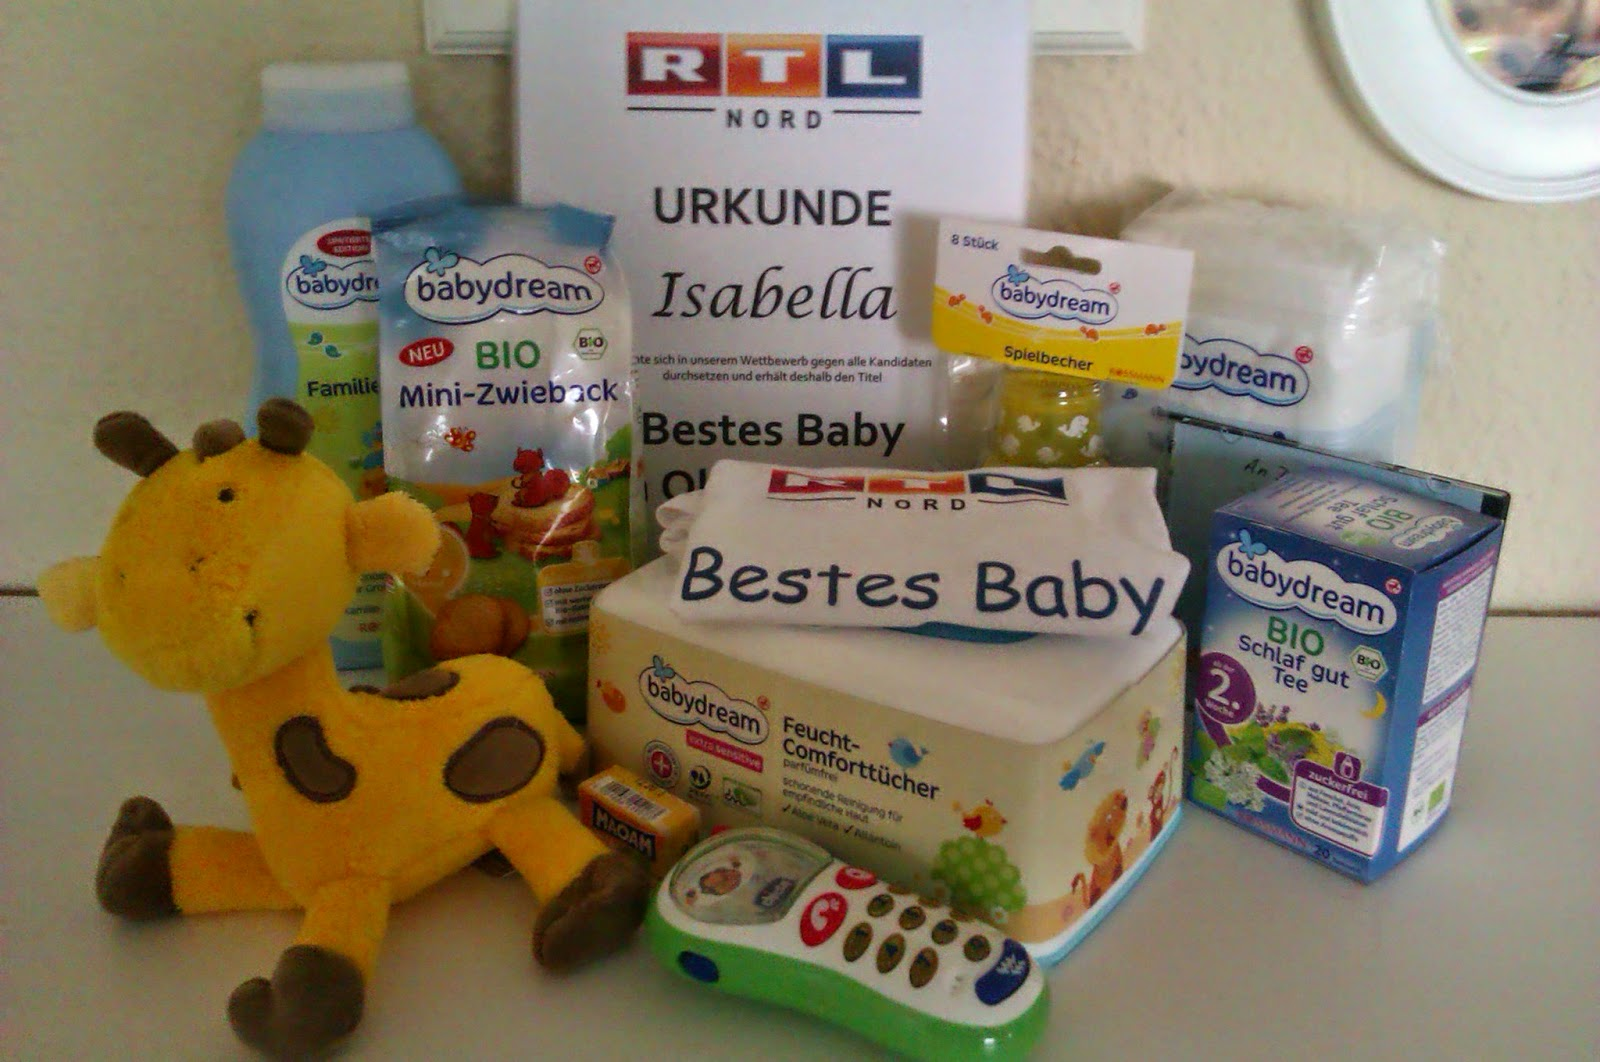 Filines Testblog, RTL Nord